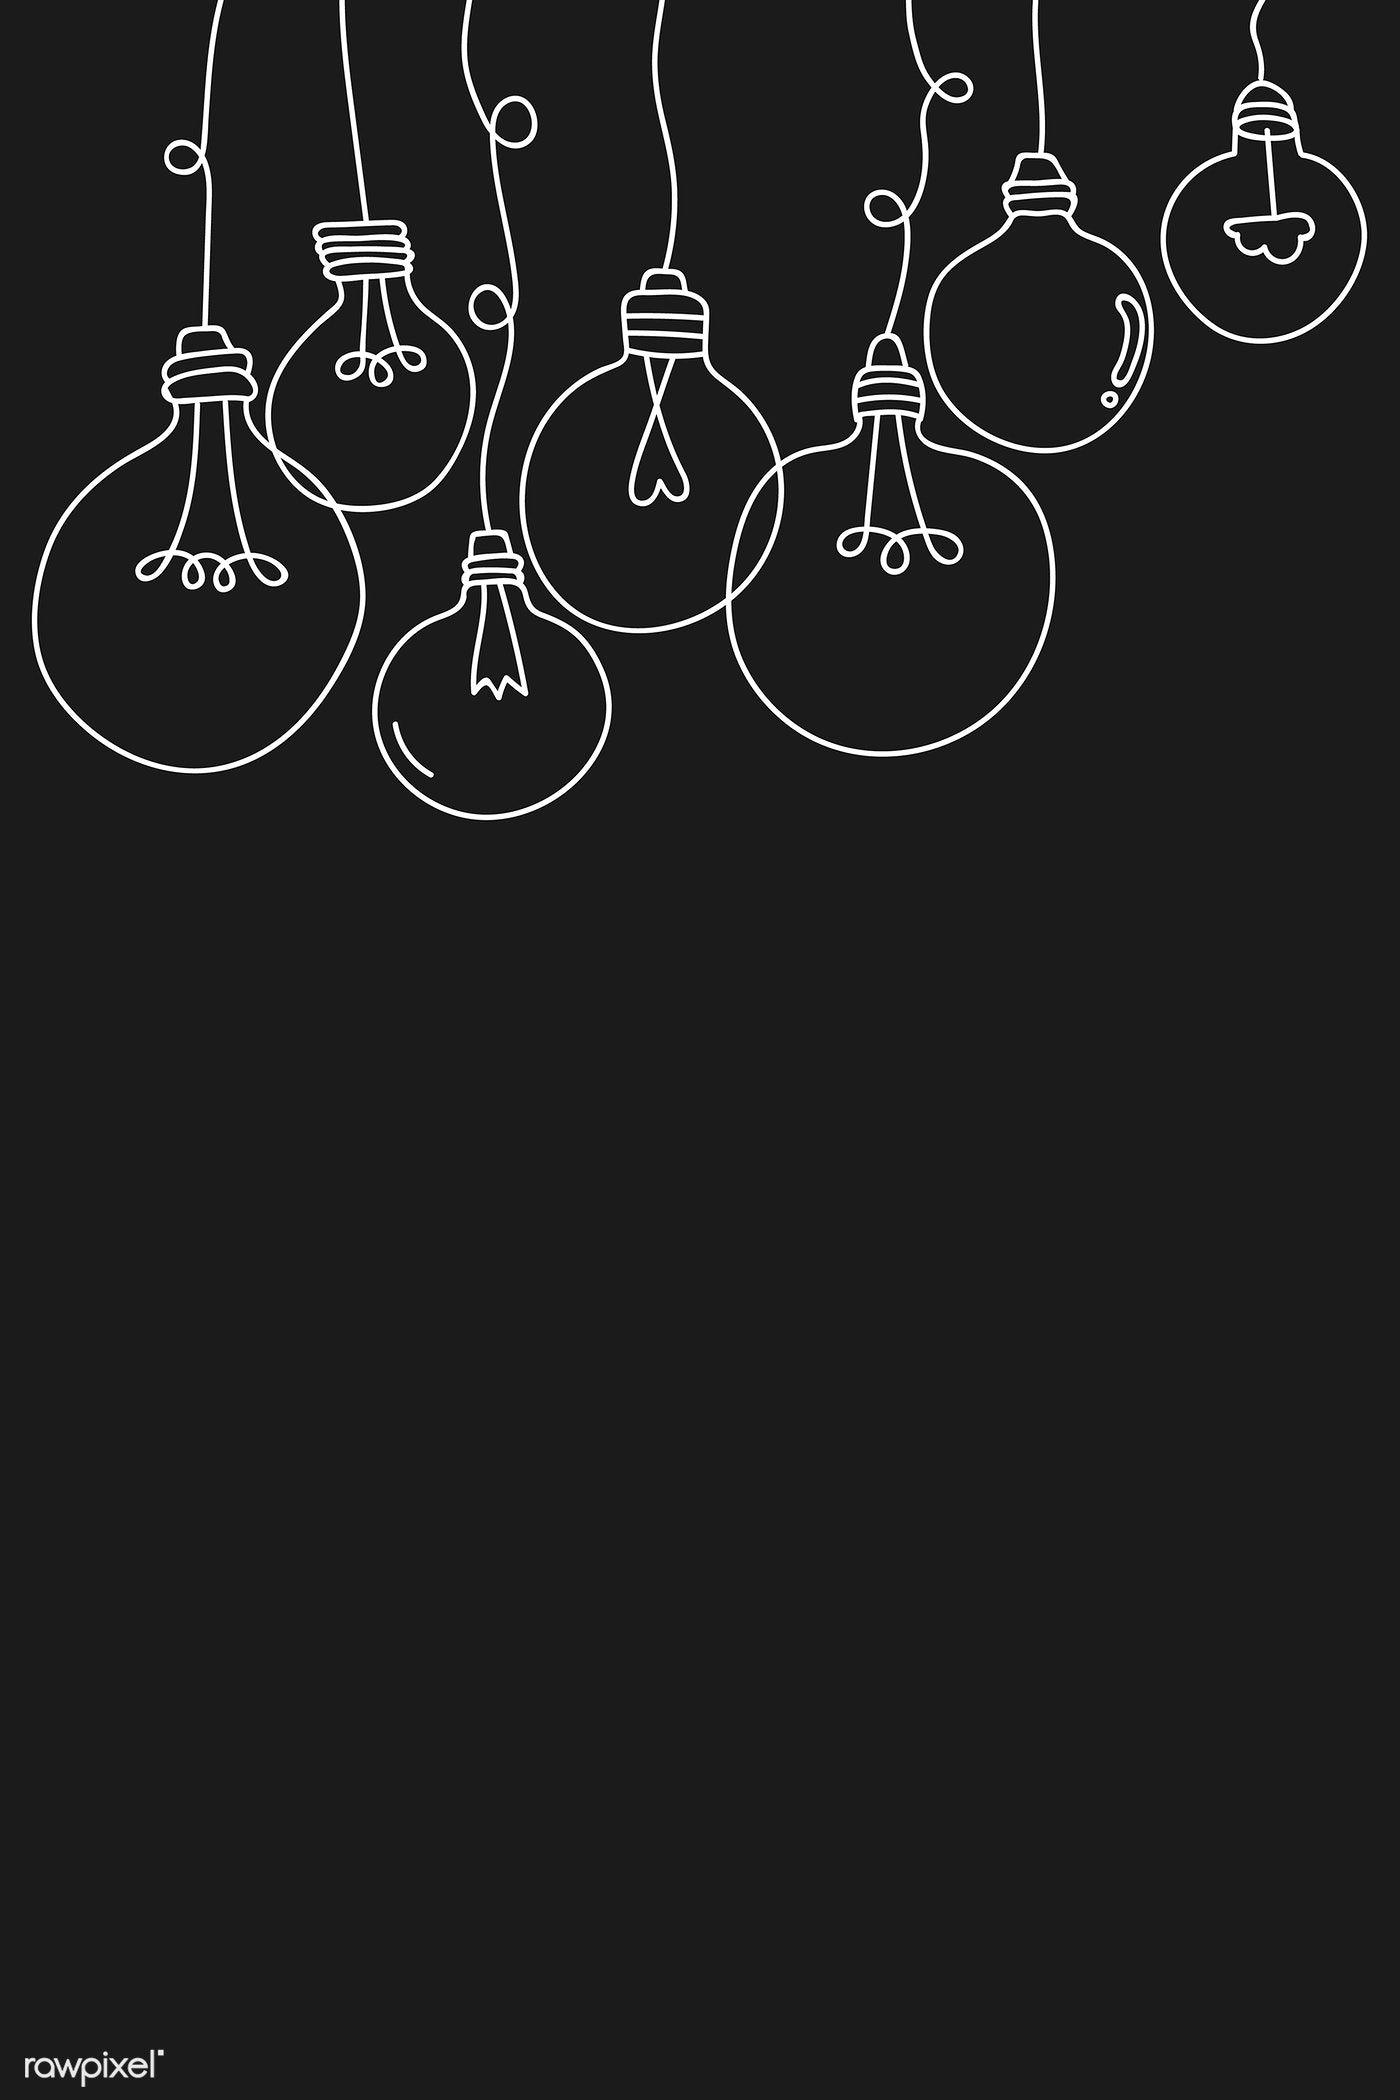 Download premium vector of Creative light bulb doodle on black background